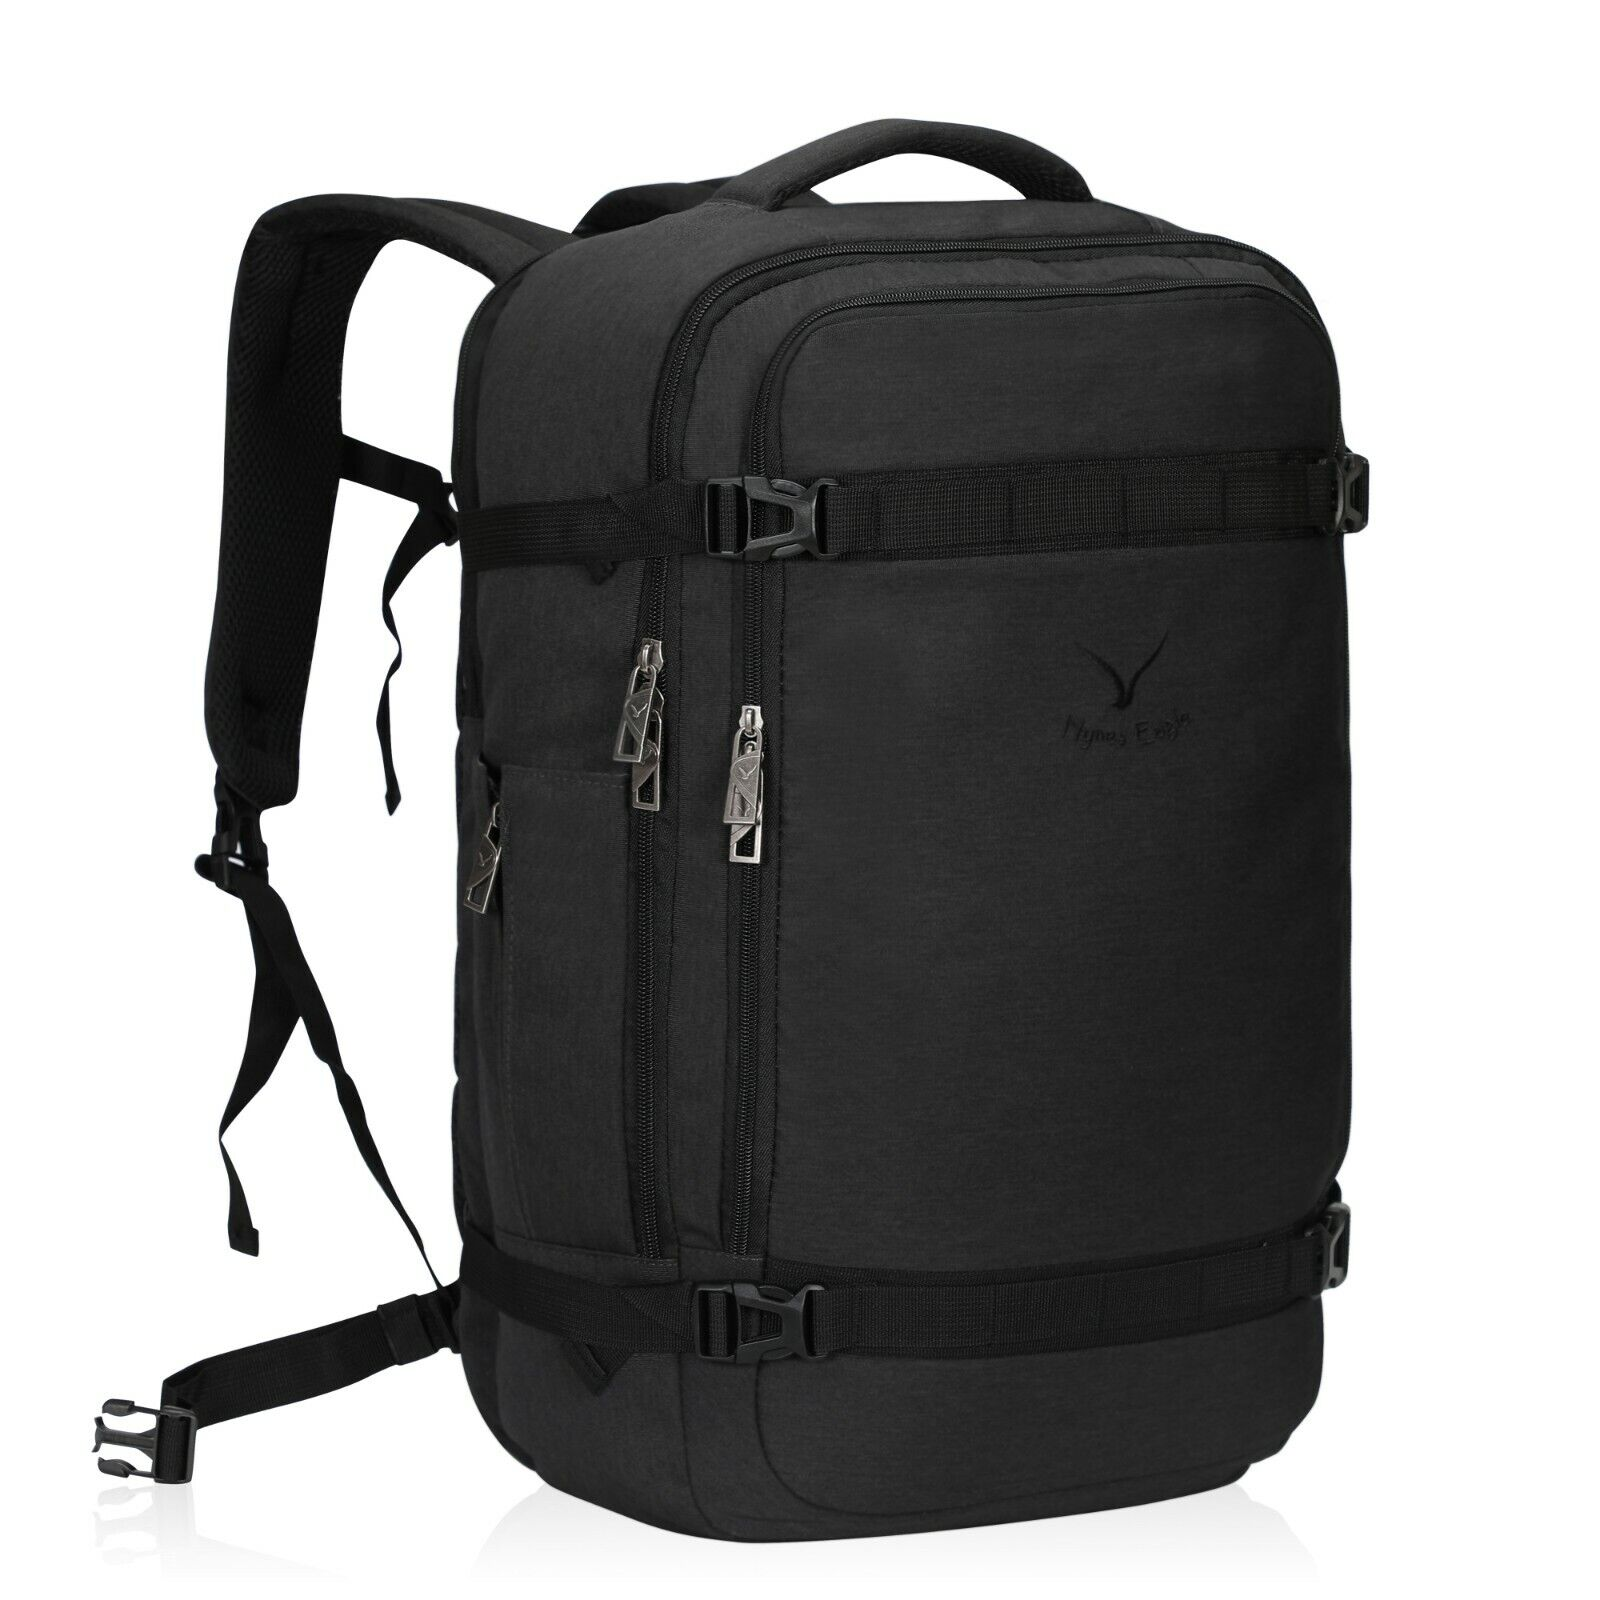 Hynes Eagle 44L Travel Backpack Airline Approved Carry on Backpack Weekender Bag